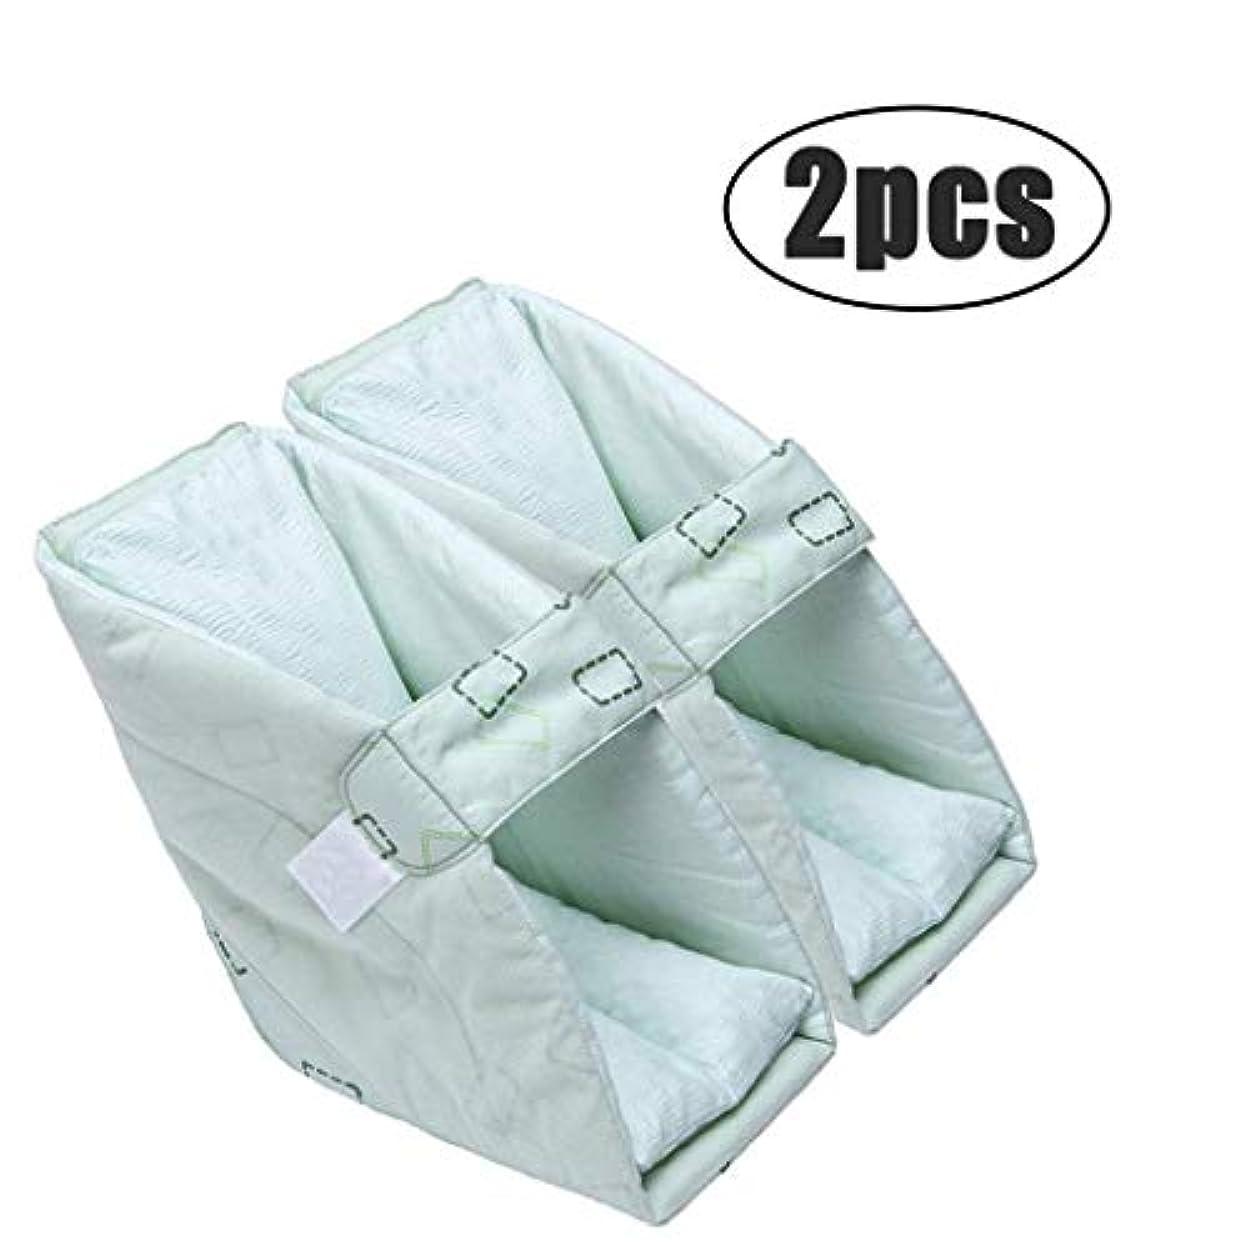 有用政策まとめるAlmohadillas para los pies Protectores para el talón Cojines, almohadilla de talón en la cama antiescaras: alivio...